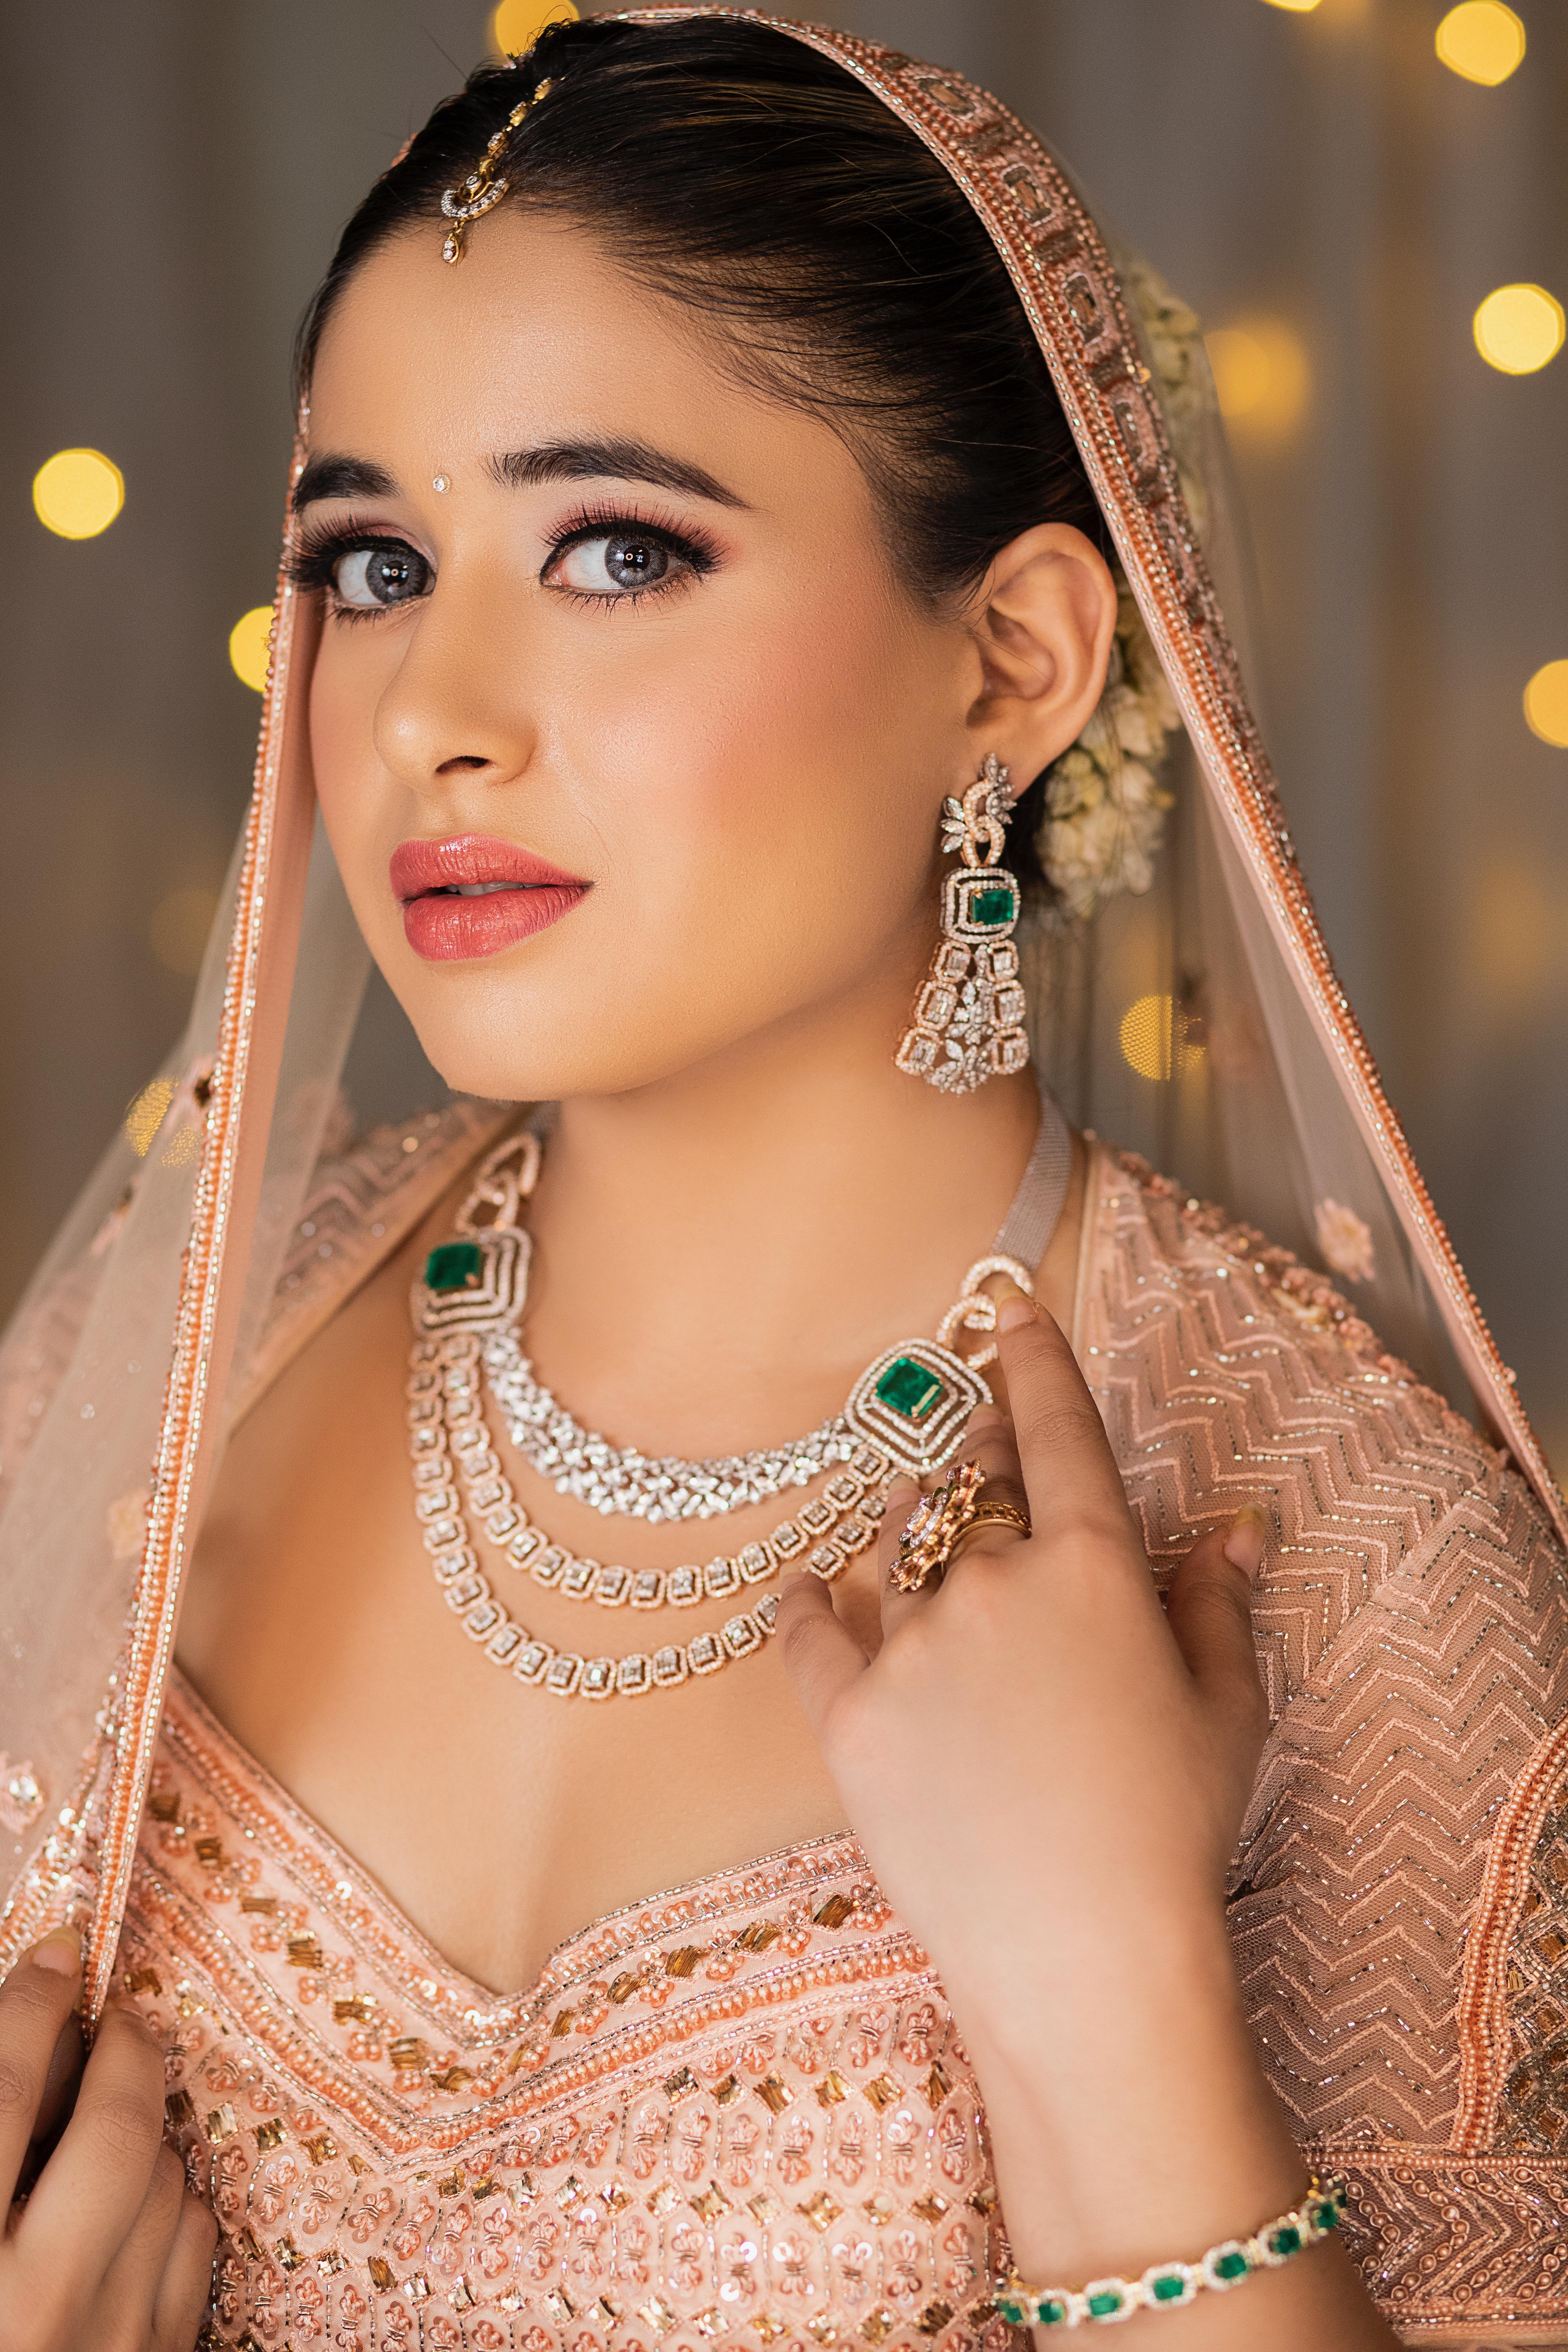 neha-devgan-makeup-artist-delhi-ncr